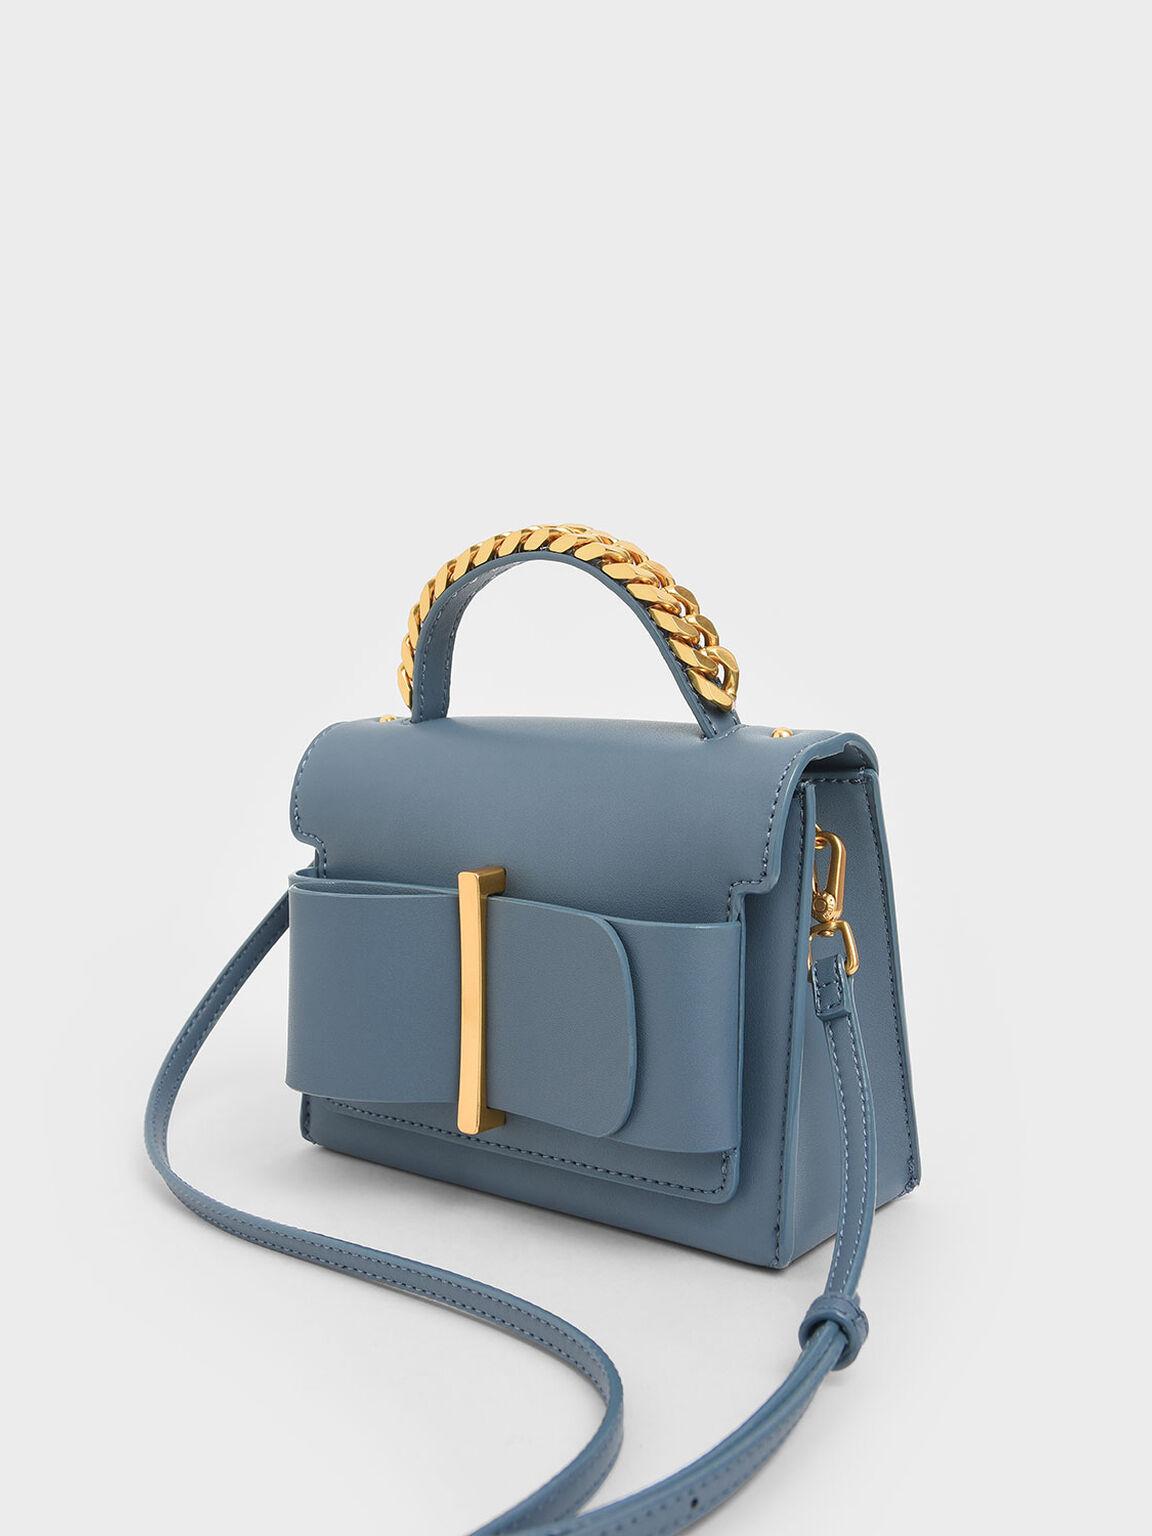 Chunky Metal Top Handle Bow Flap Bag, Slate Blue, hi-res